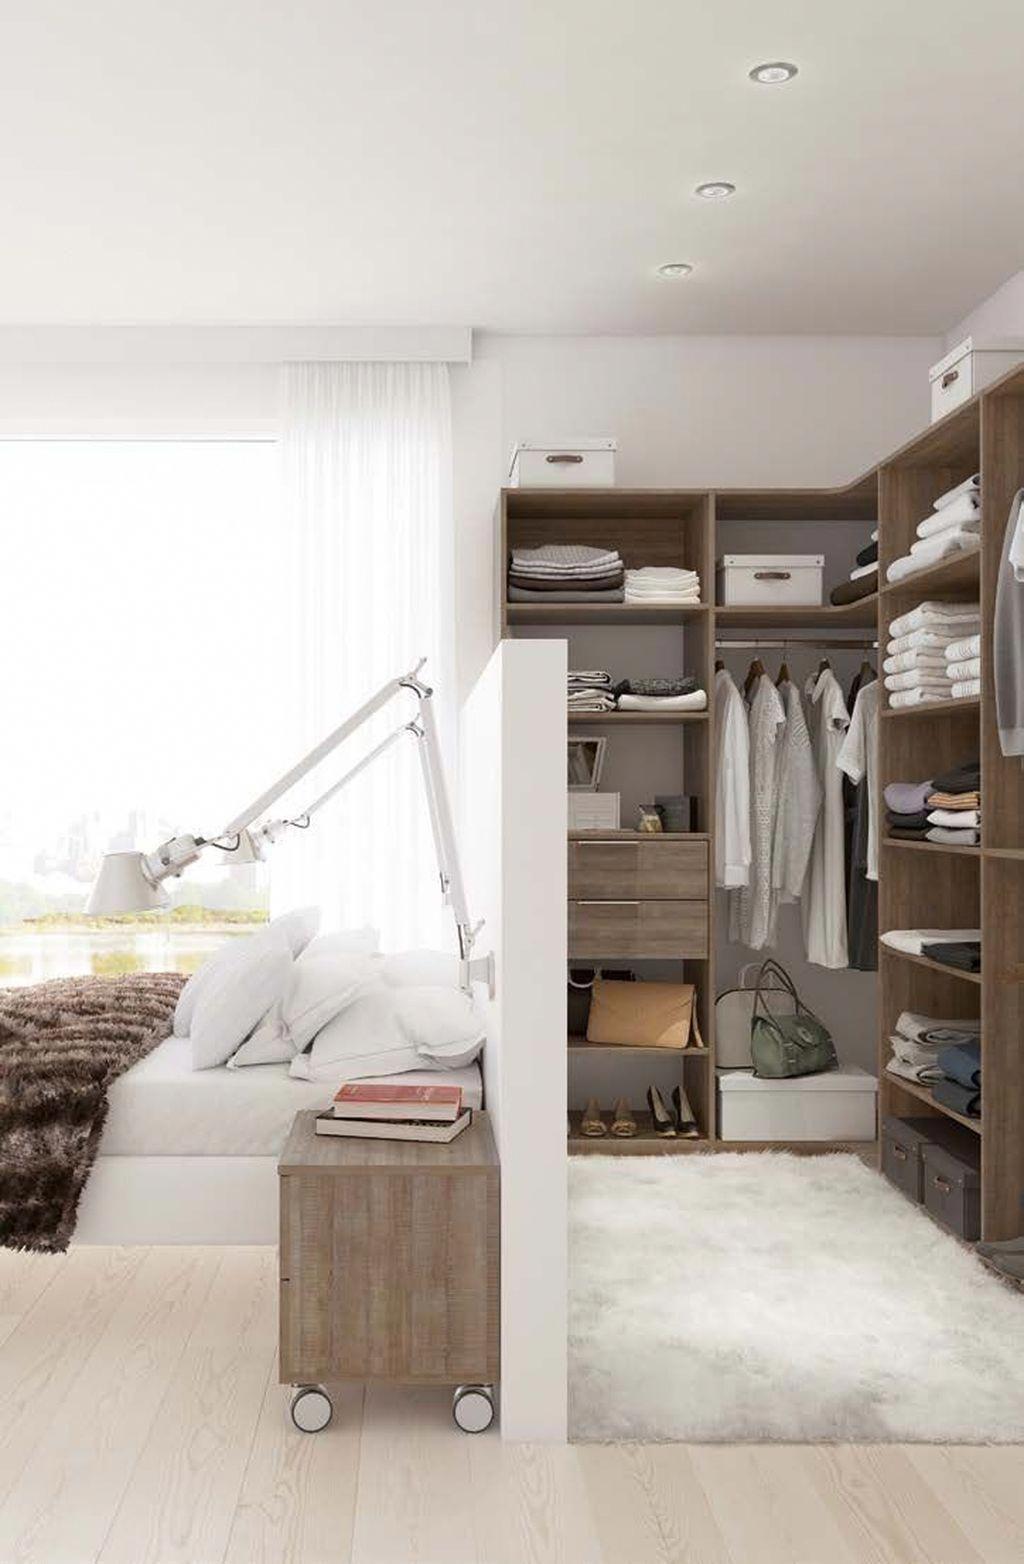 44 Creative Small Bedroom Decor Ideas Easy To Apply Modernhomedecor Chambre A Coucher Avec Dressing Amenagement Petite Chambre Chambre Parentale Avec Dressing